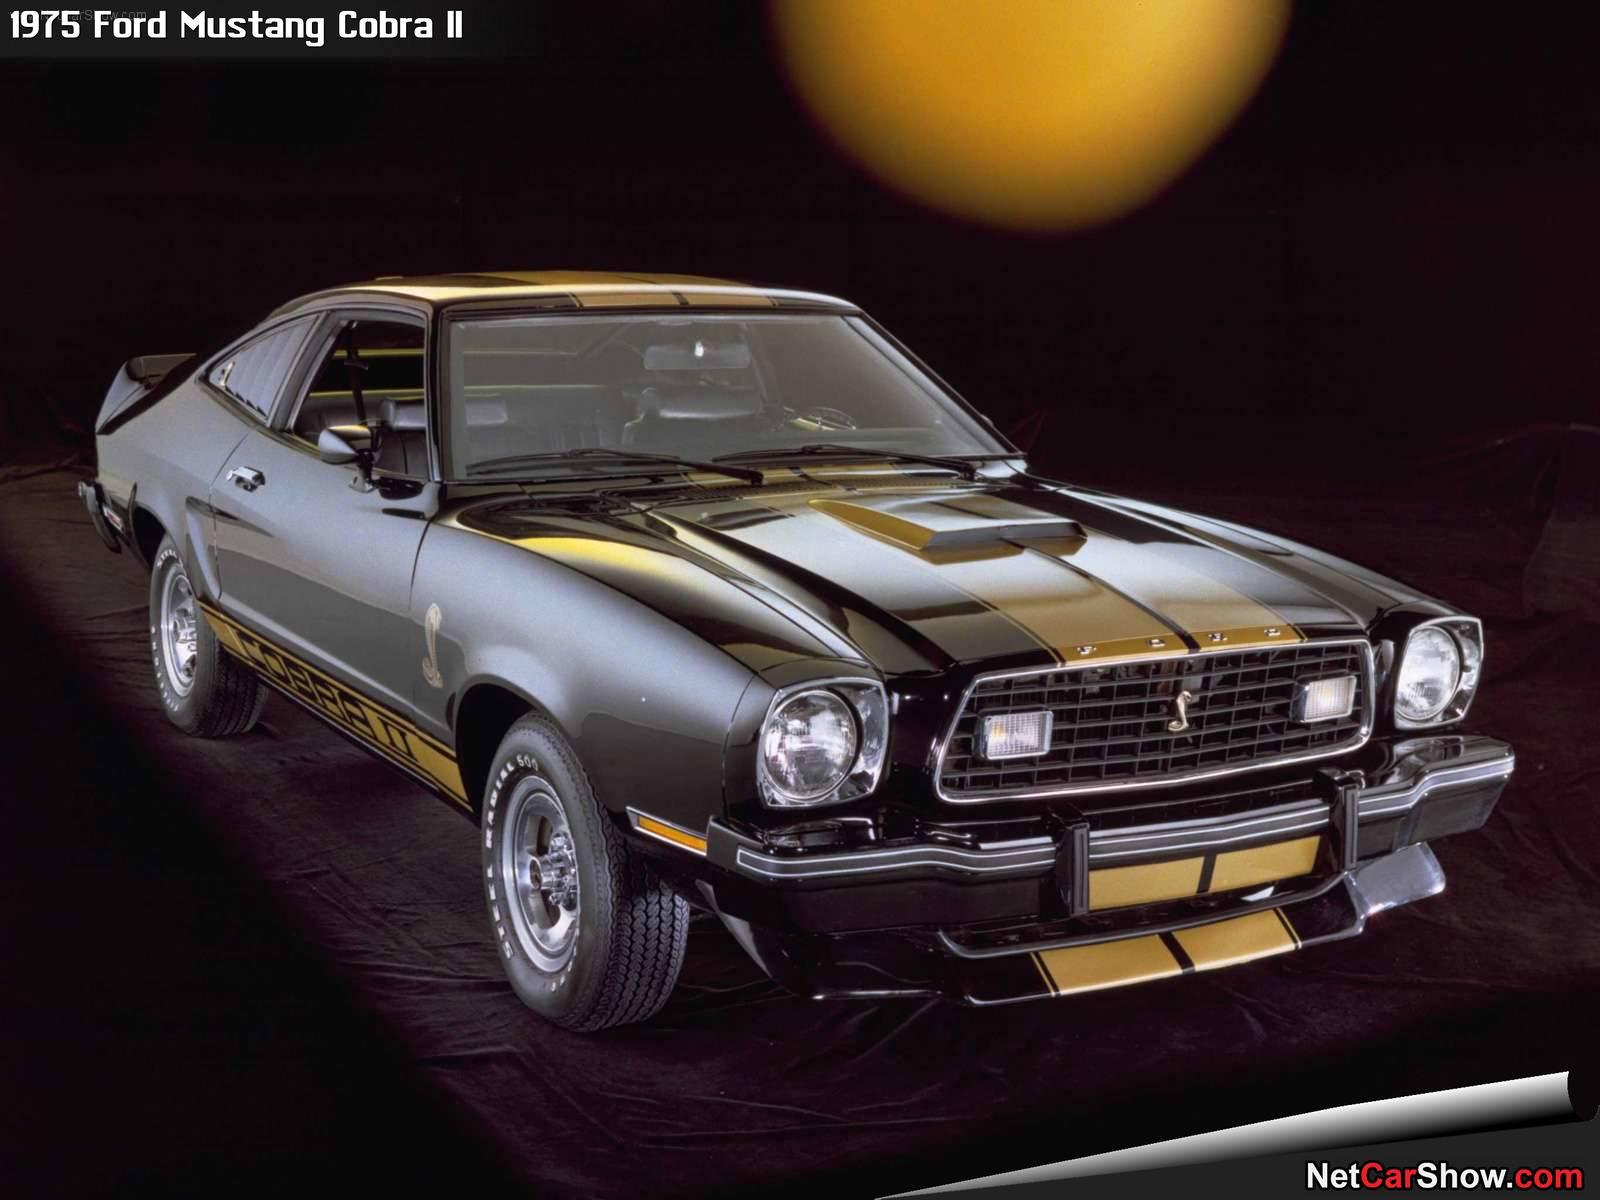 Ford-Mustang_Cobra_II-1975-wallpaper.jpg